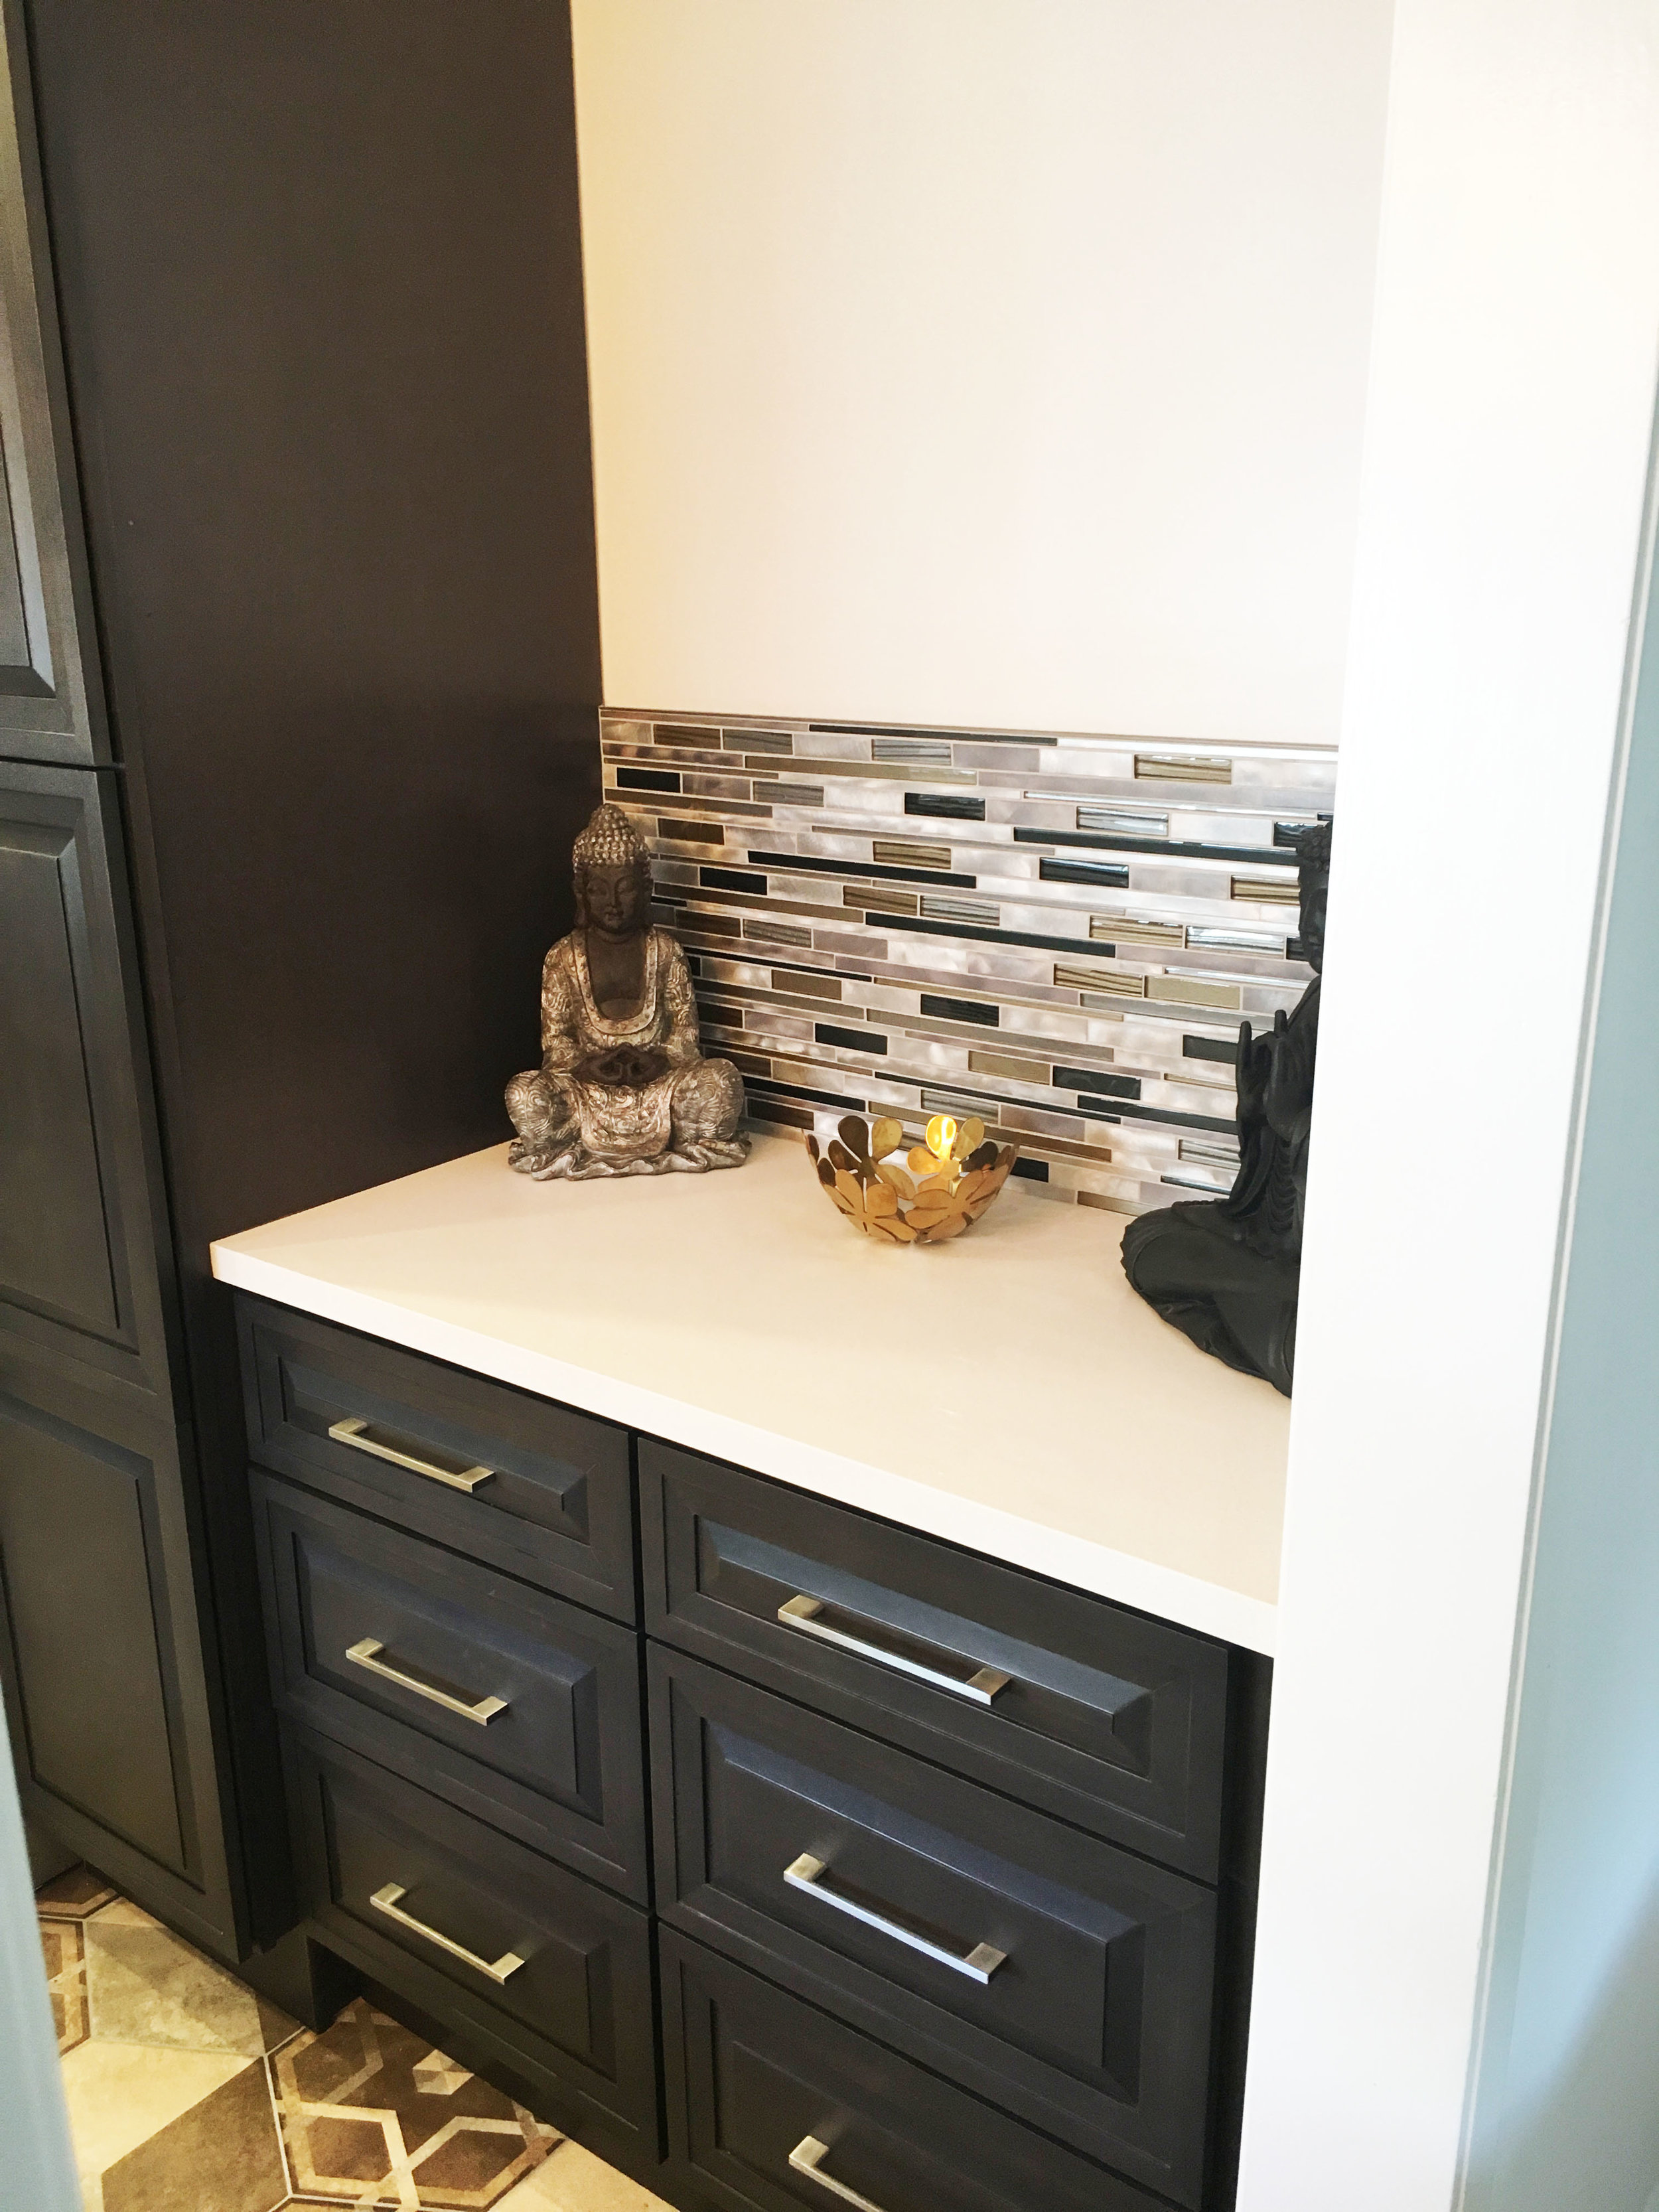 Kitchen remodel area.jpg